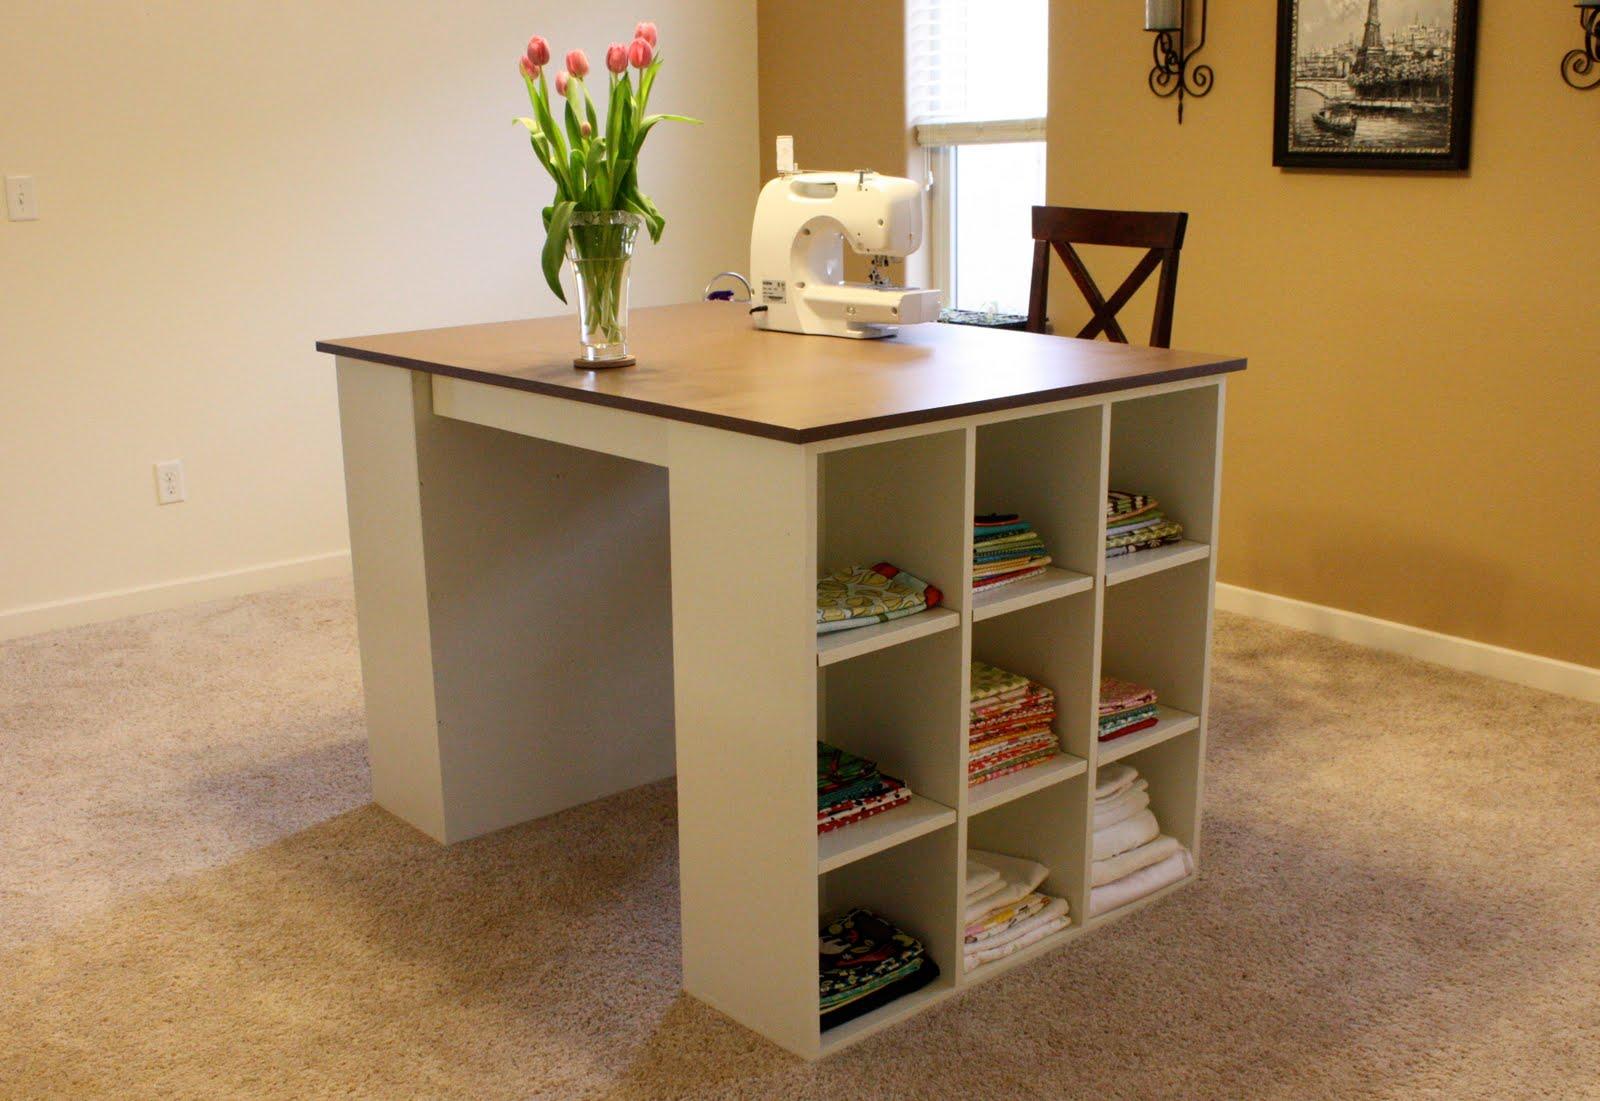 Diy Craft Table Plans.Woodworking Ija Diy Craft Table Plans